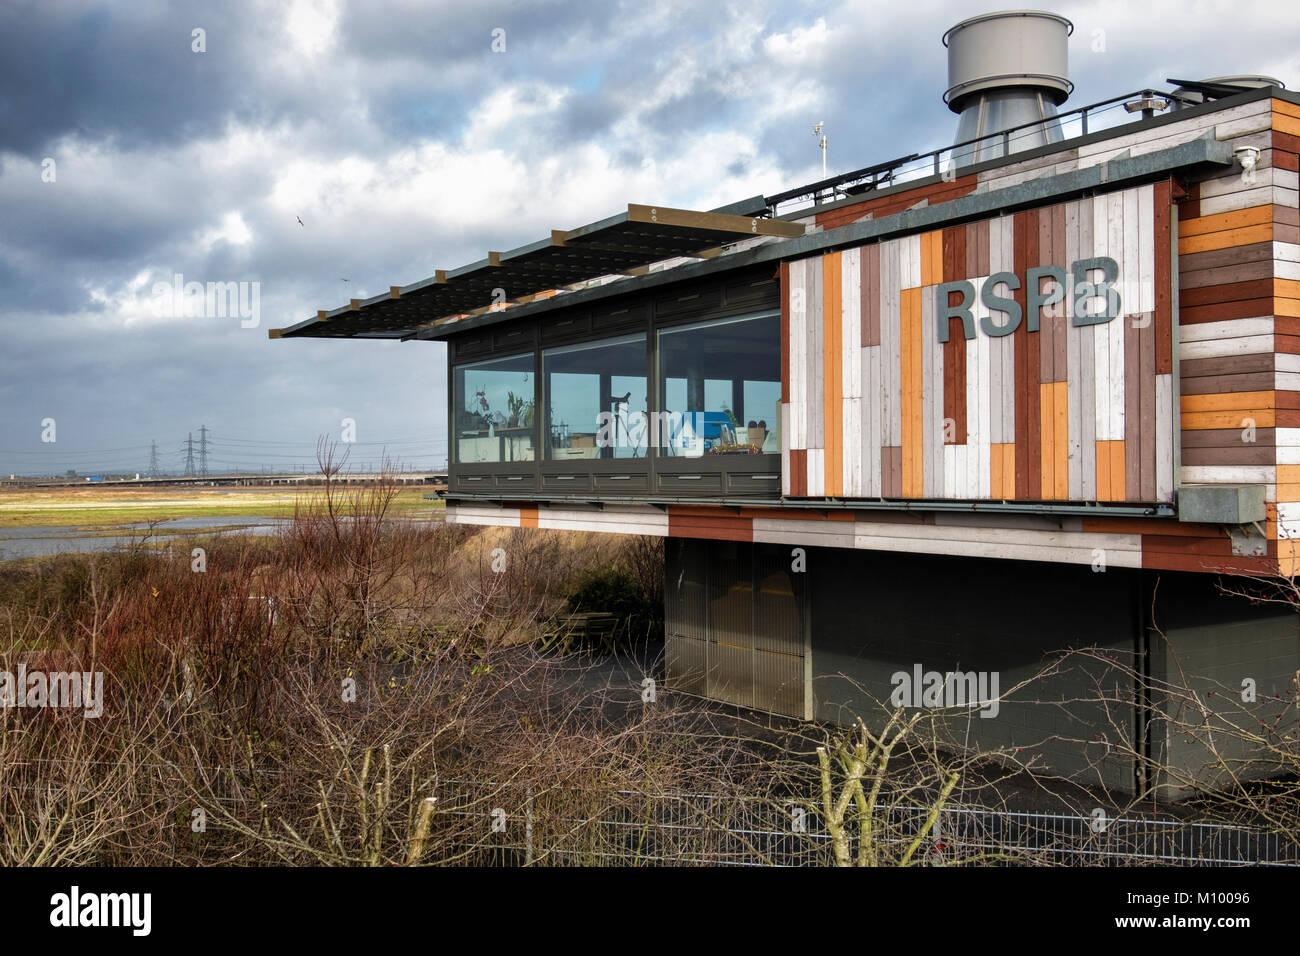 Essex UK. Visitor Centre of Rainham Marshes RSPB nature reserve next to Thames Estuary in Purfleet,Environmentally - Stock Image